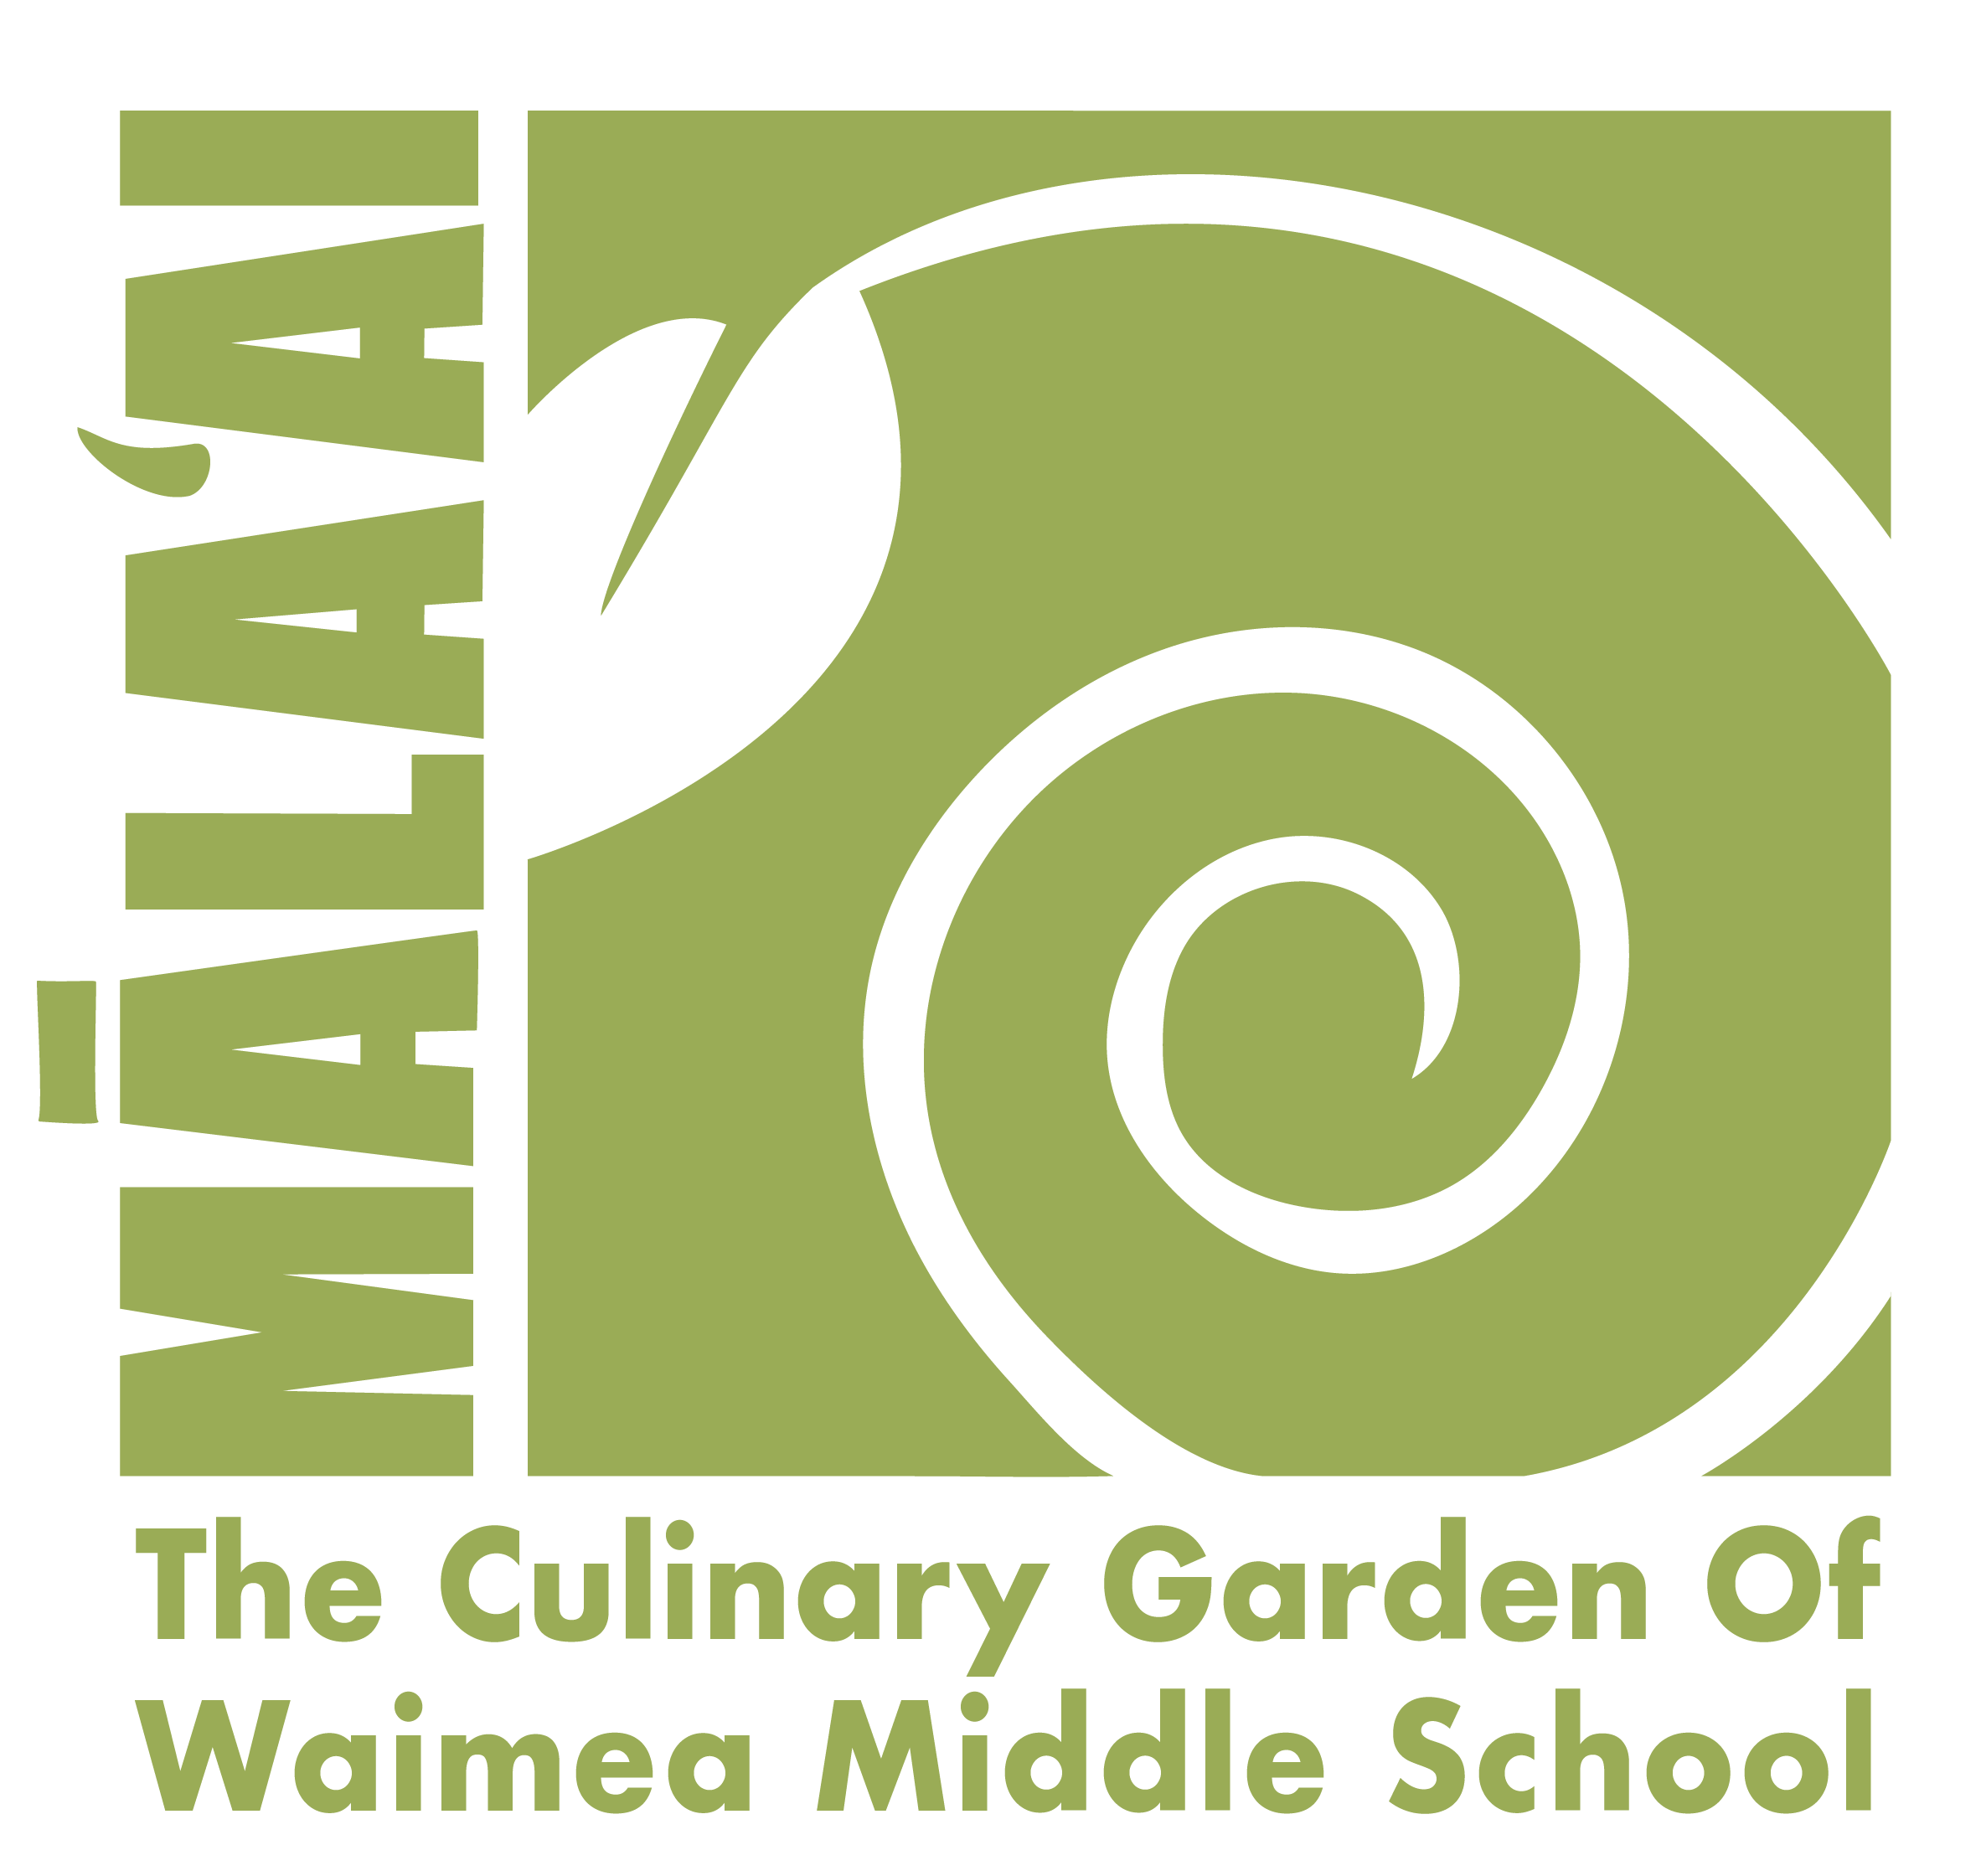 Mālaʻai – The Culinary Garden of Waimea Middle School